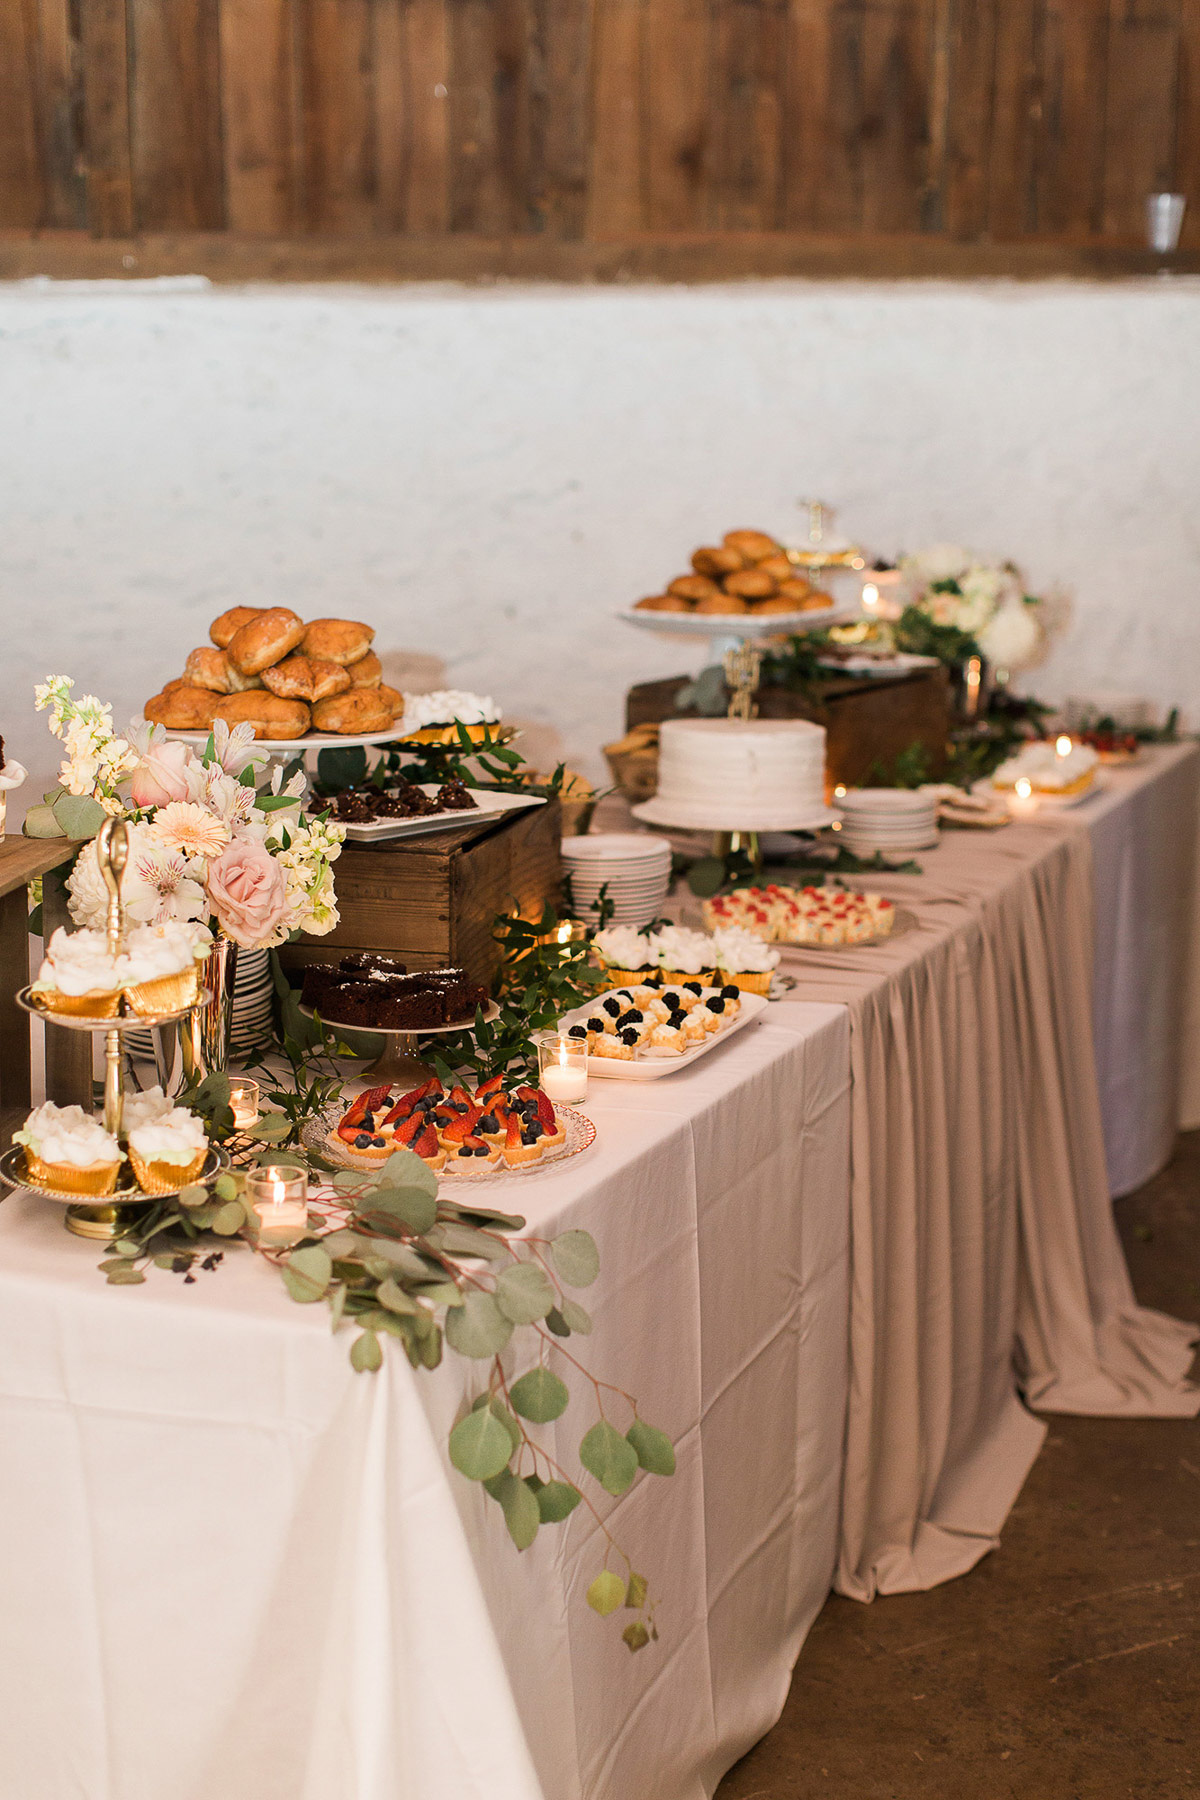 beatrice-elford-photography-vineyard-bride-swish-list-balls-falls-vineland-wedding-67.jpg